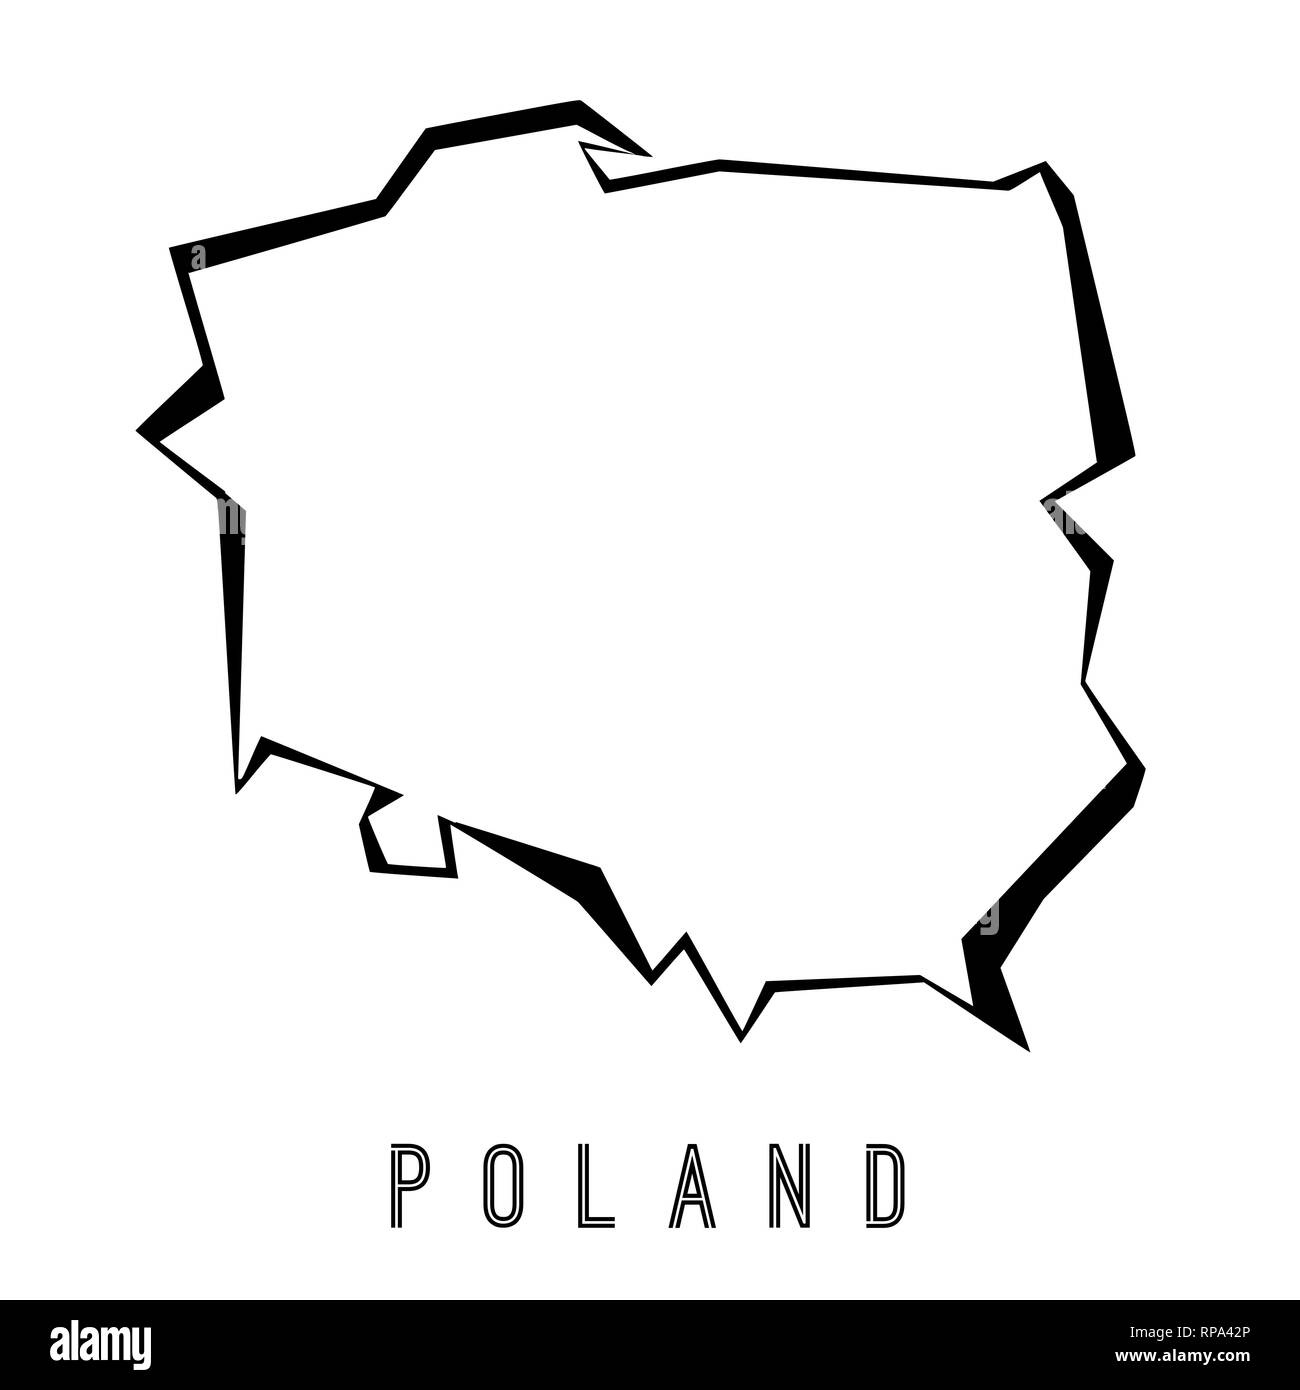 Polen Karte Umriss.Polen Umriss Stockfotos Polen Umriss Bilder Alamy